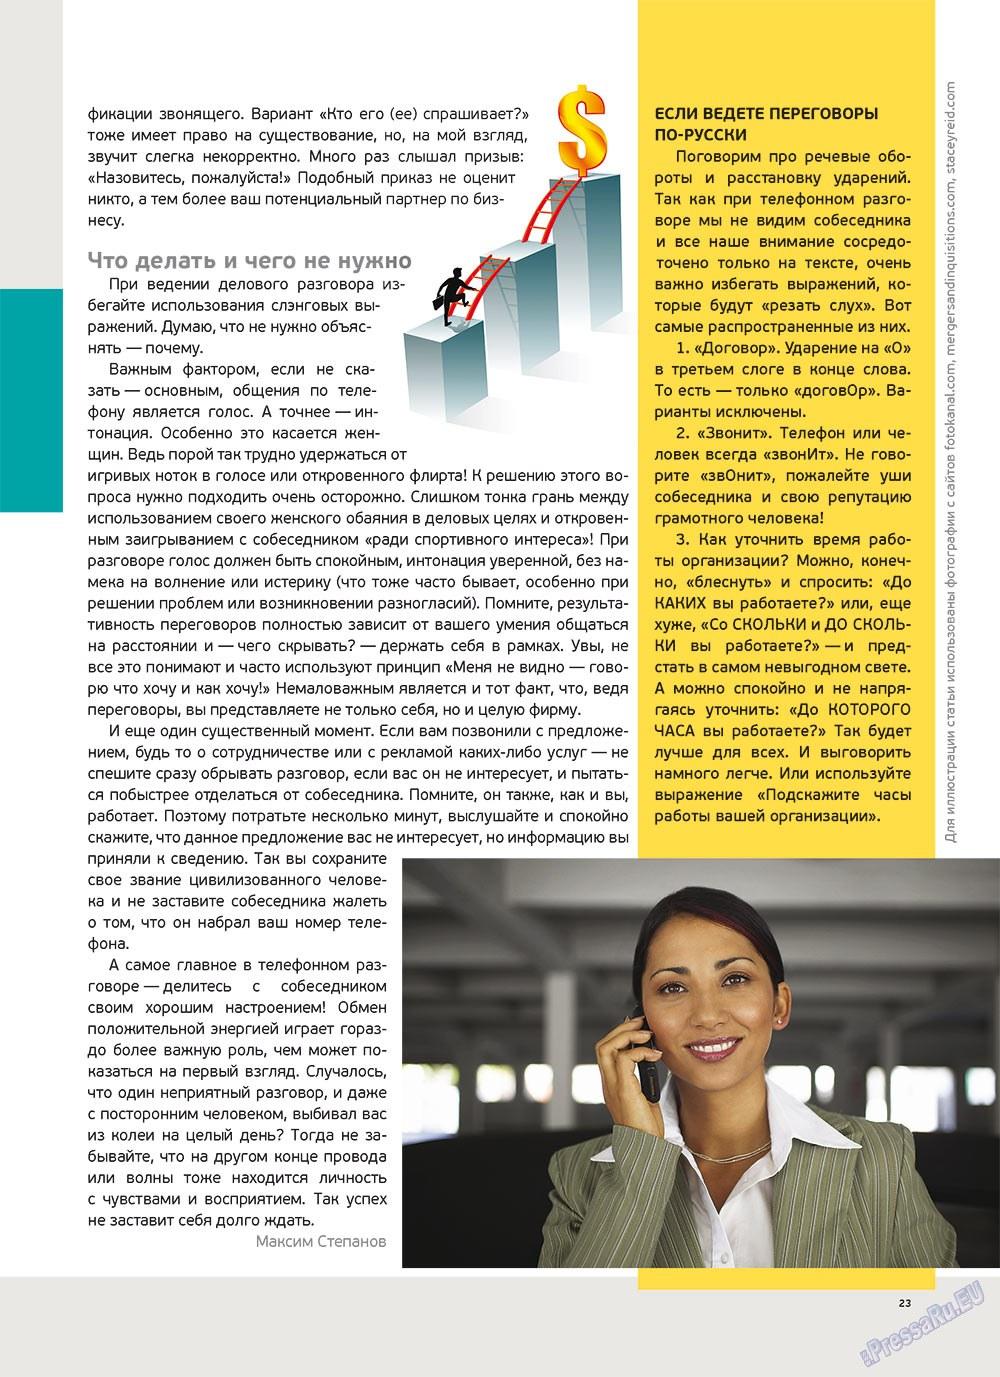 Артек (журнал). 2012 год, номер 3, стр. 25